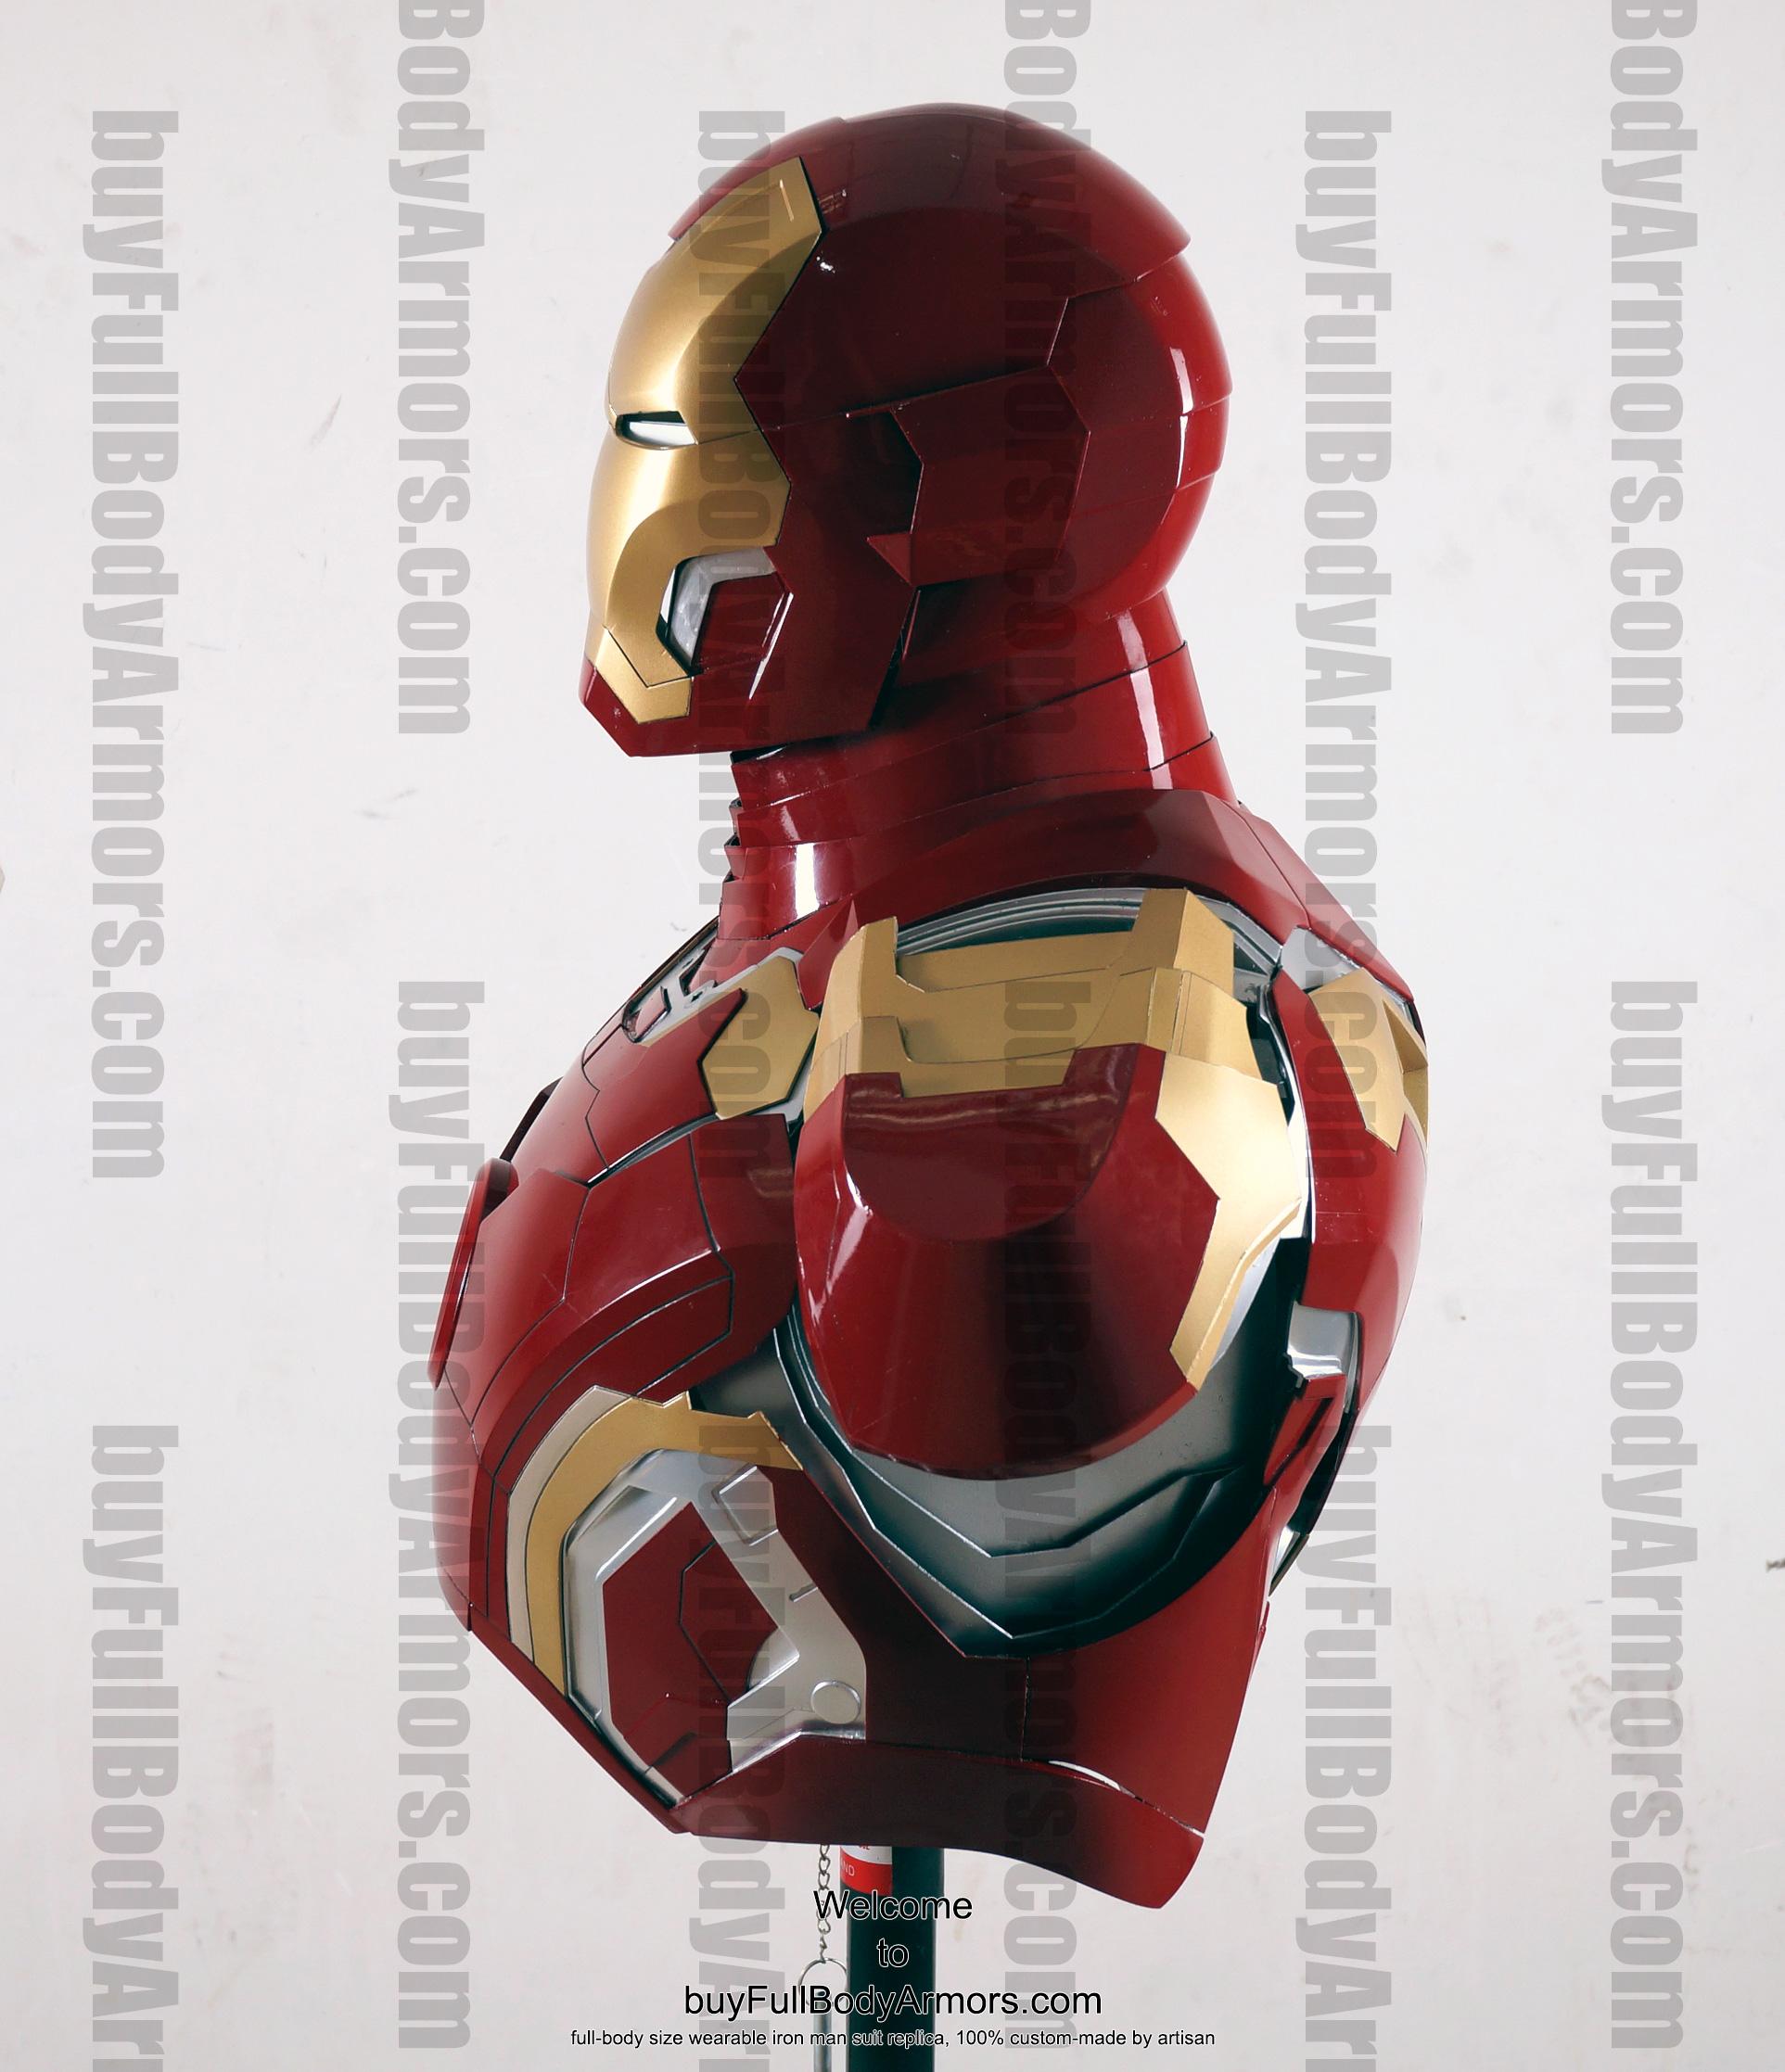 the wearable Iron Man Mark 43 (XLIII) suit costume bust side 2